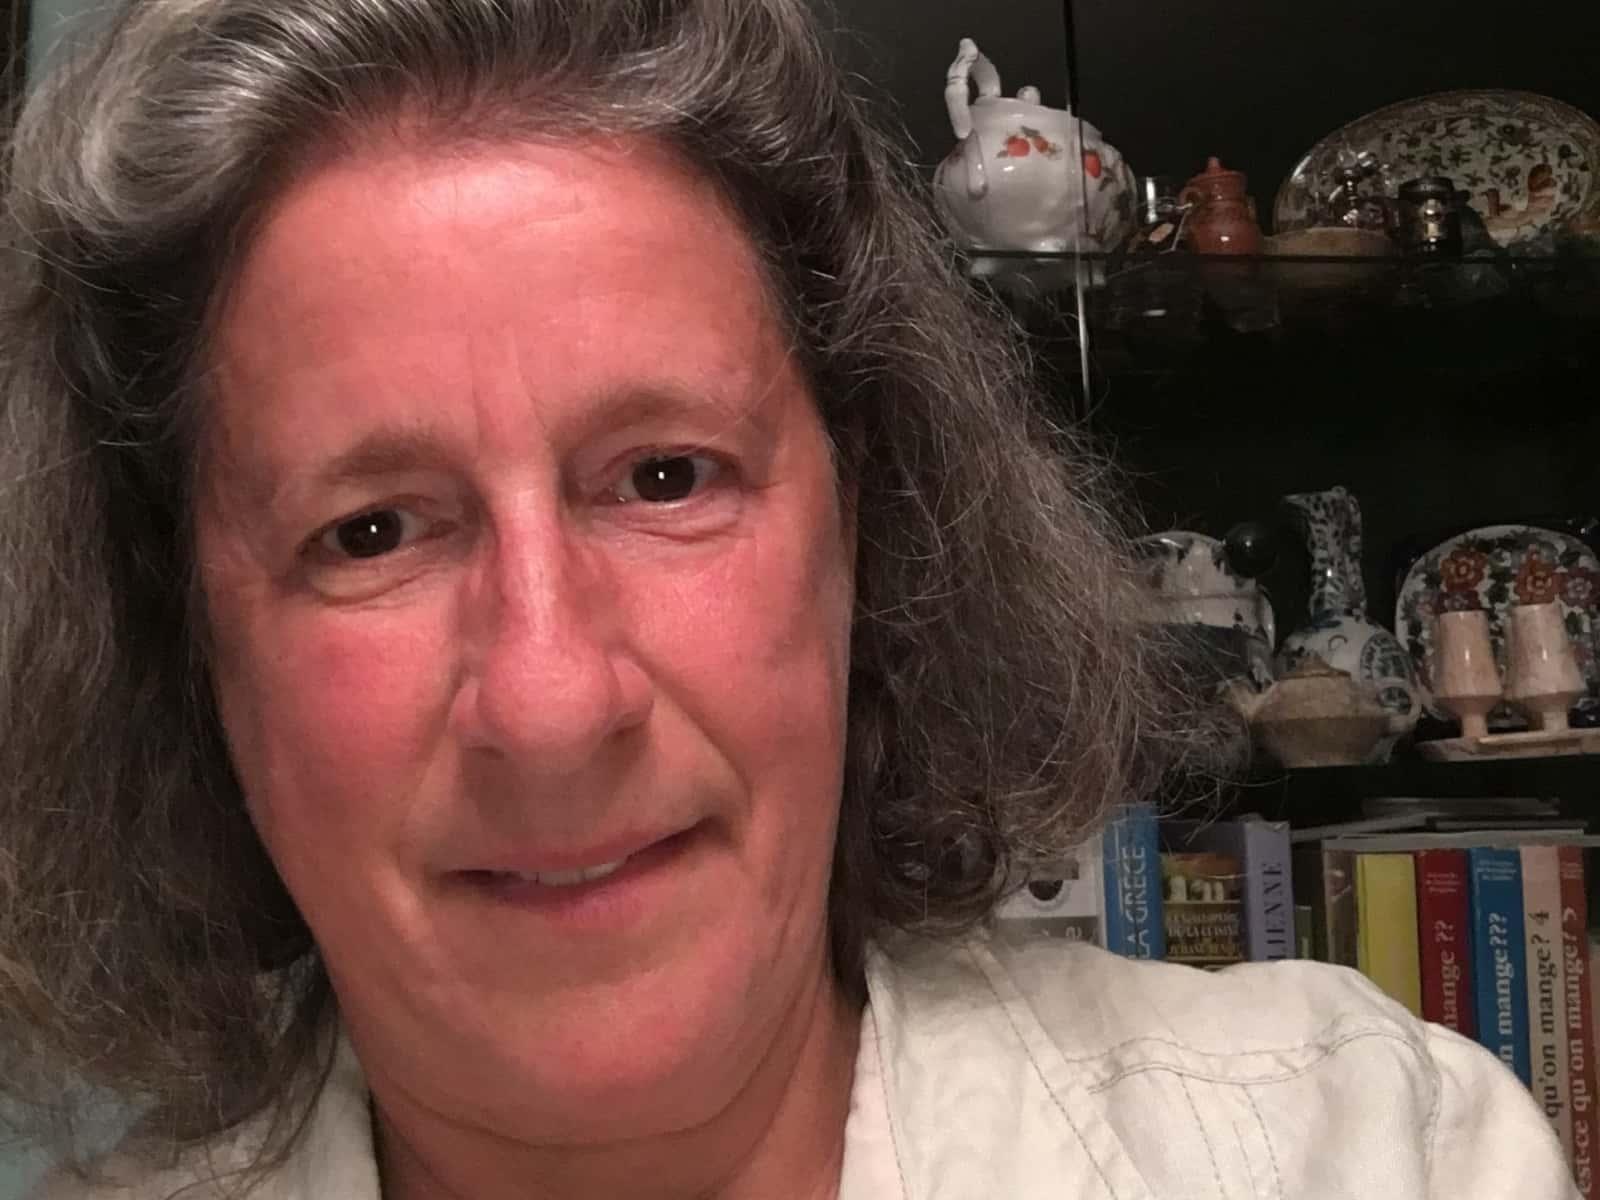 Maureen from Trois-Rivières, Quebec, Canada